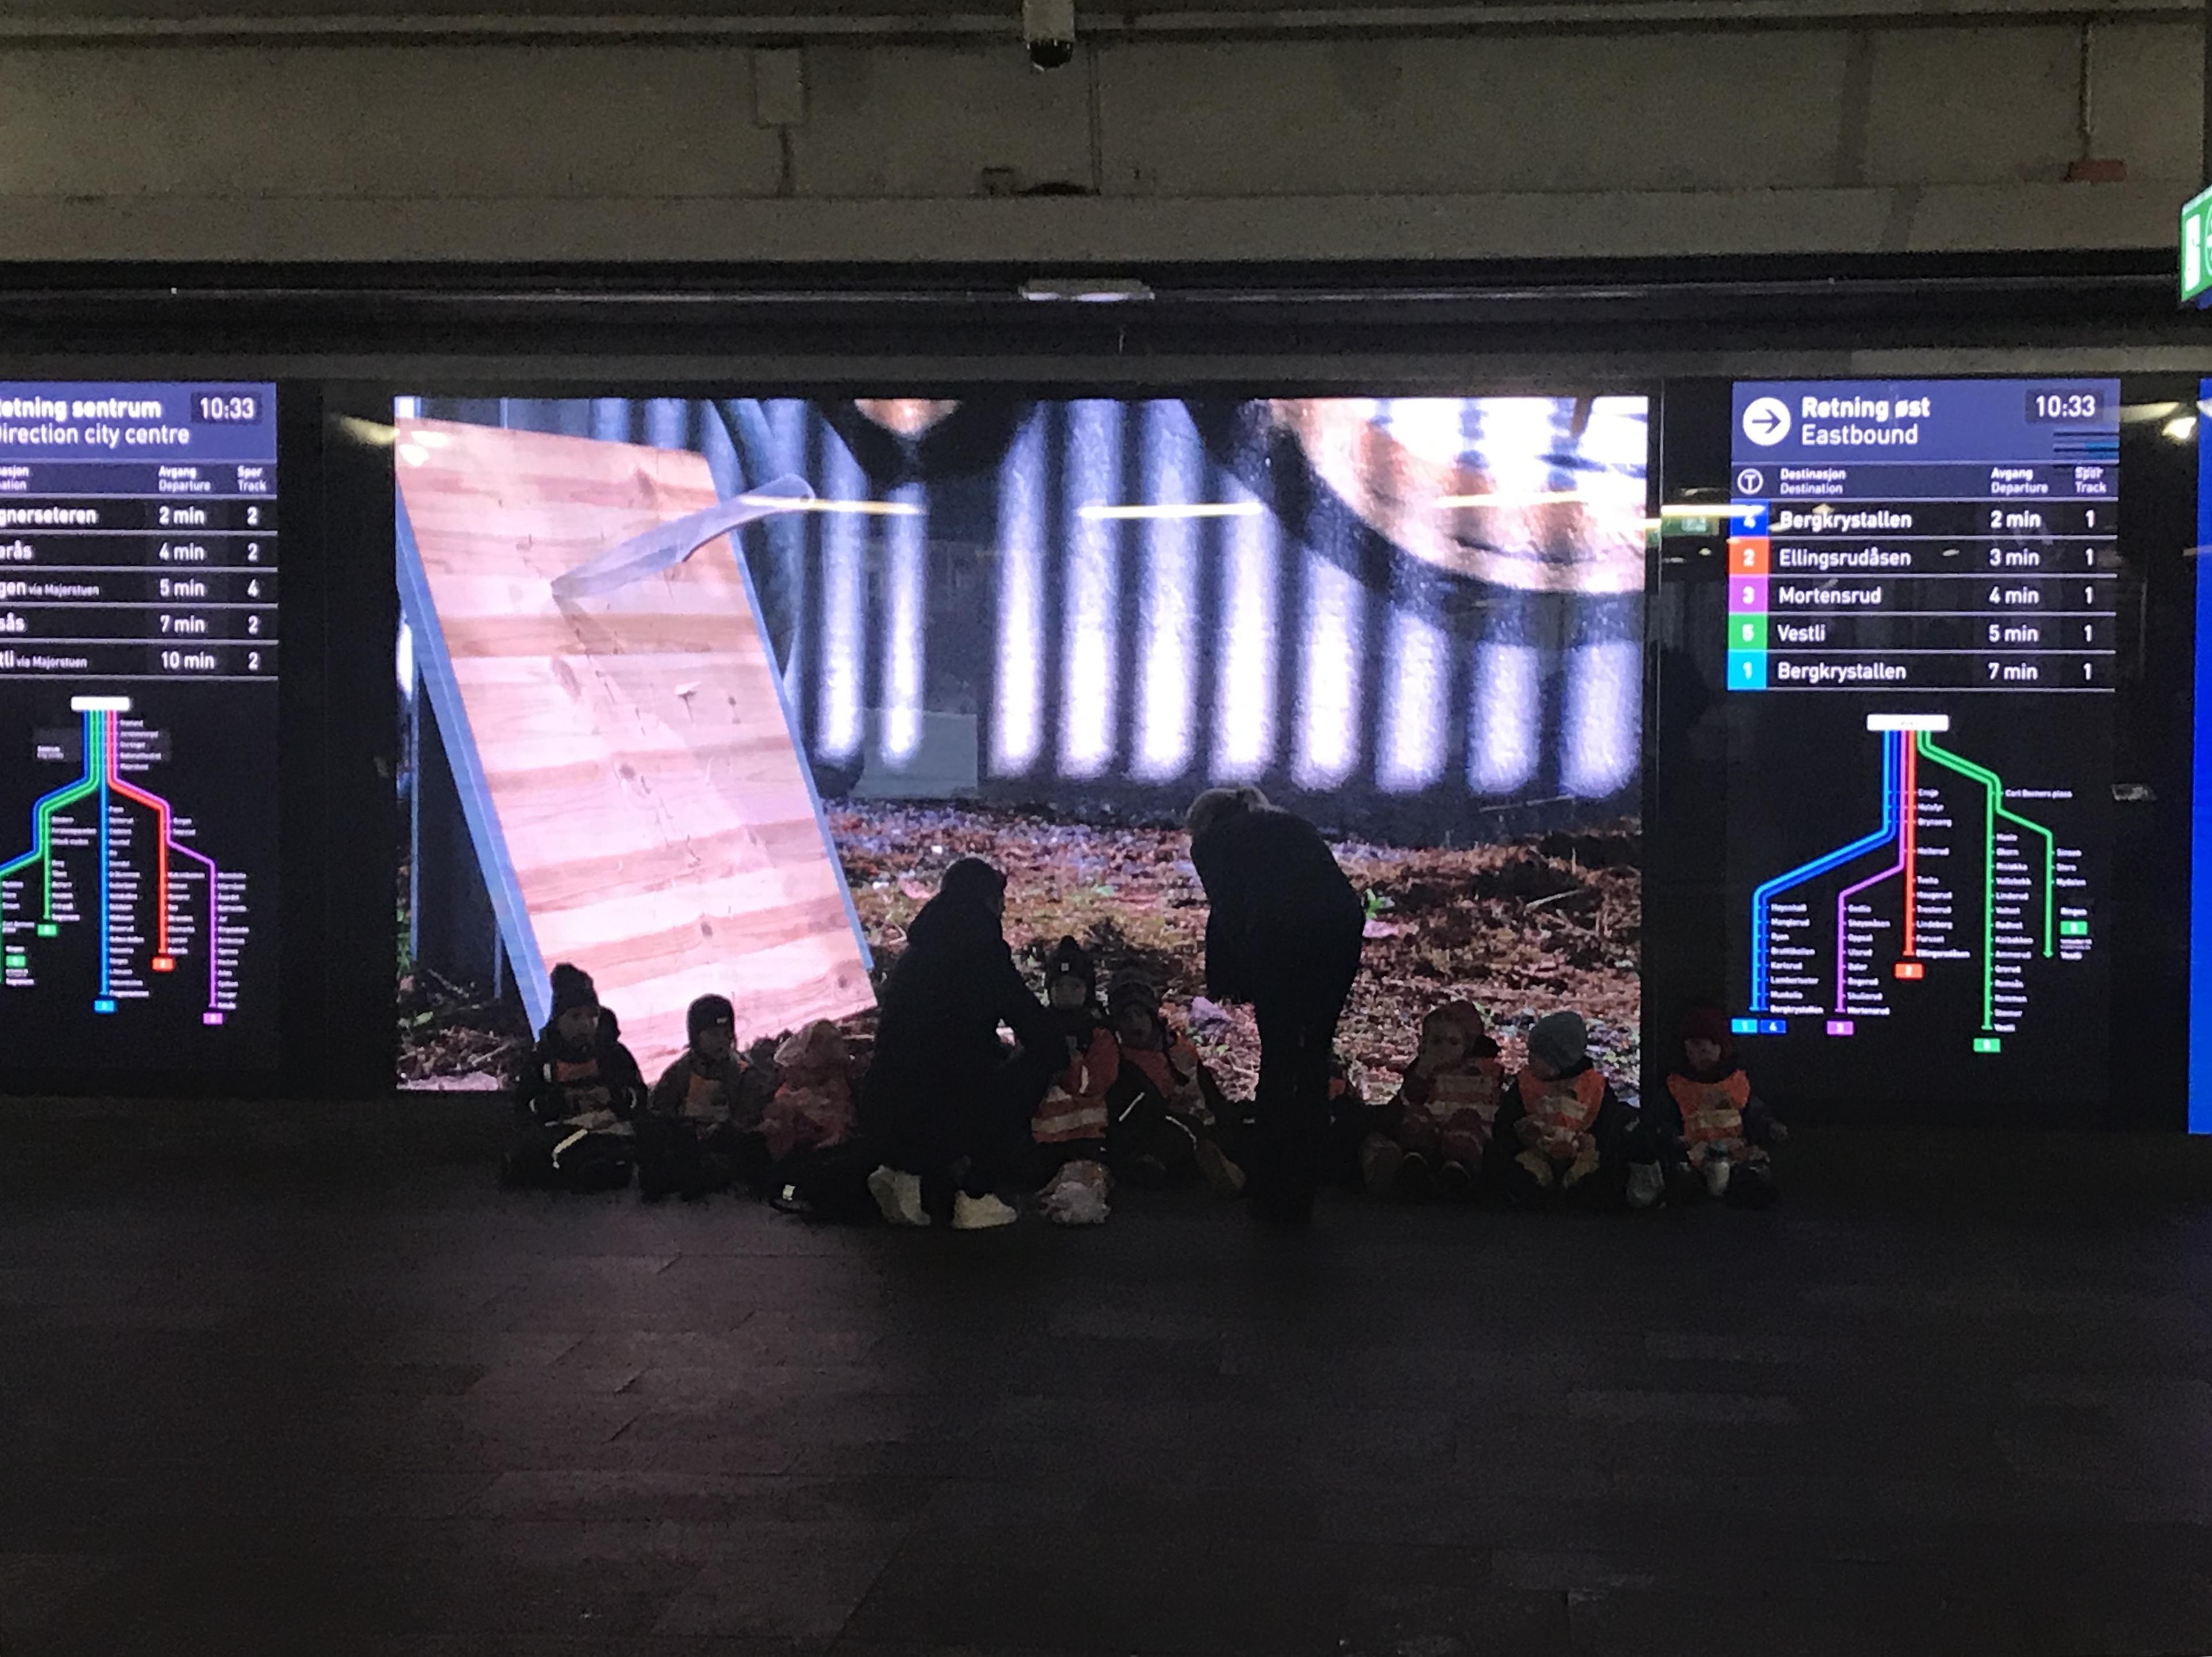 Oslo 1, work, installed at Tøyen T-bane stop 2020